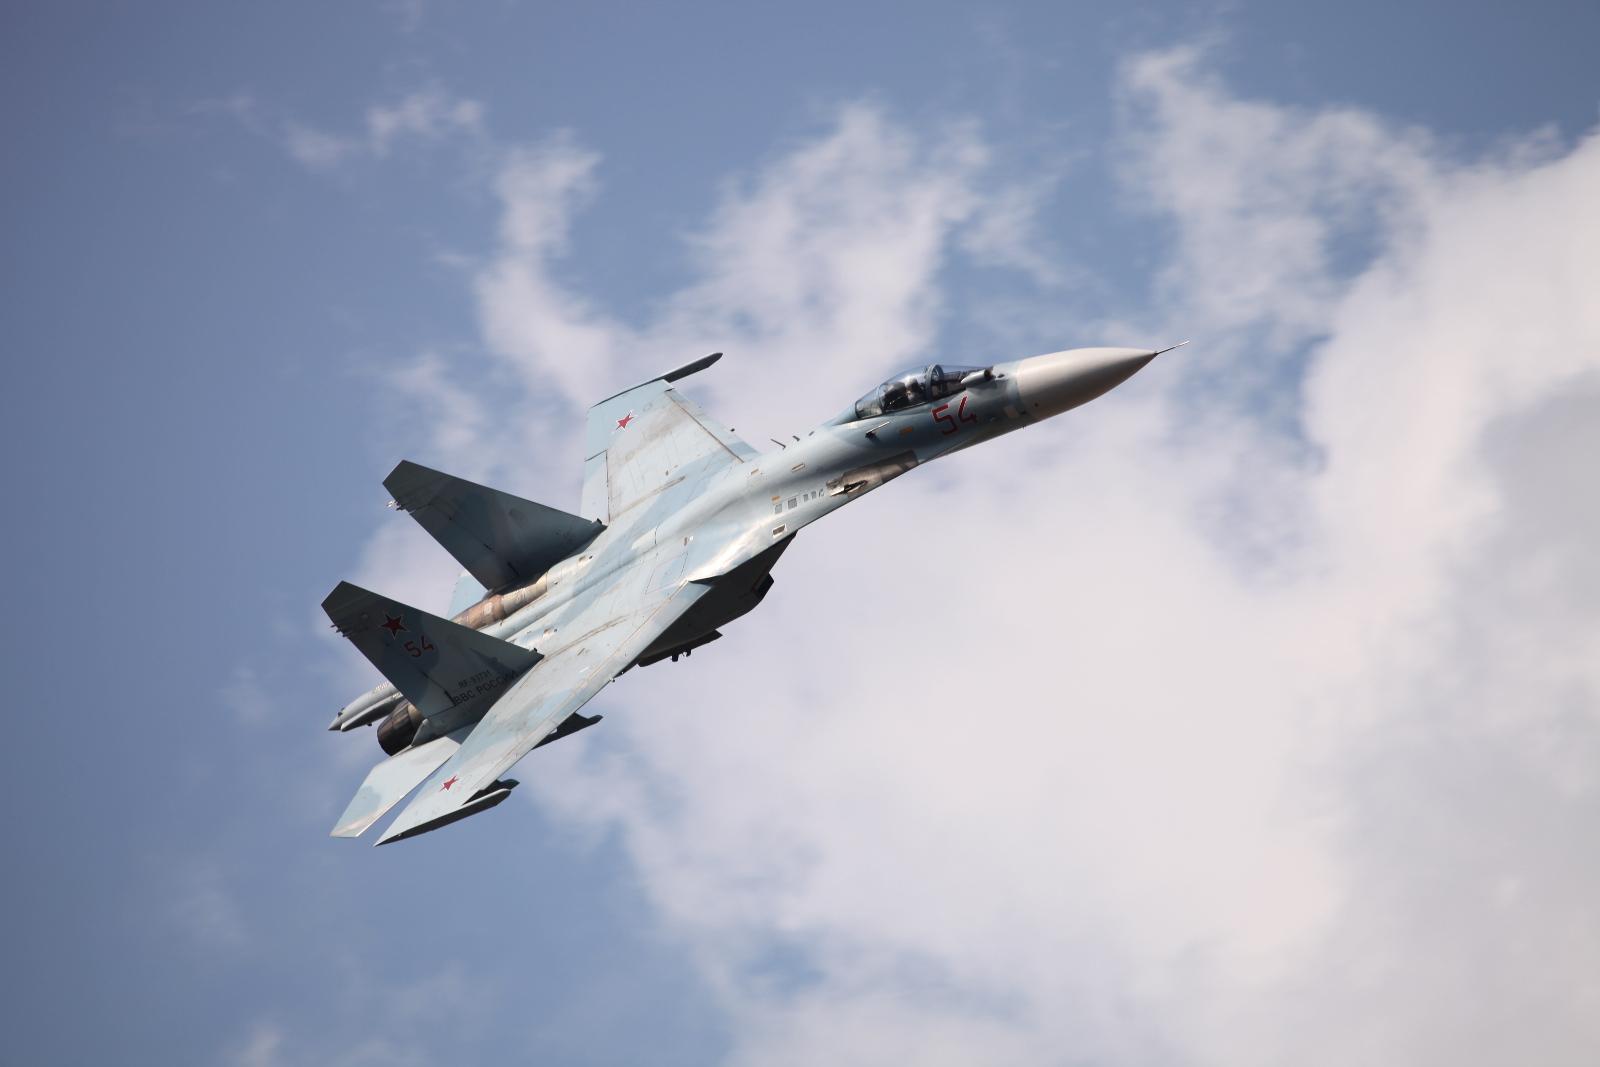 Russia Air Force SU-27